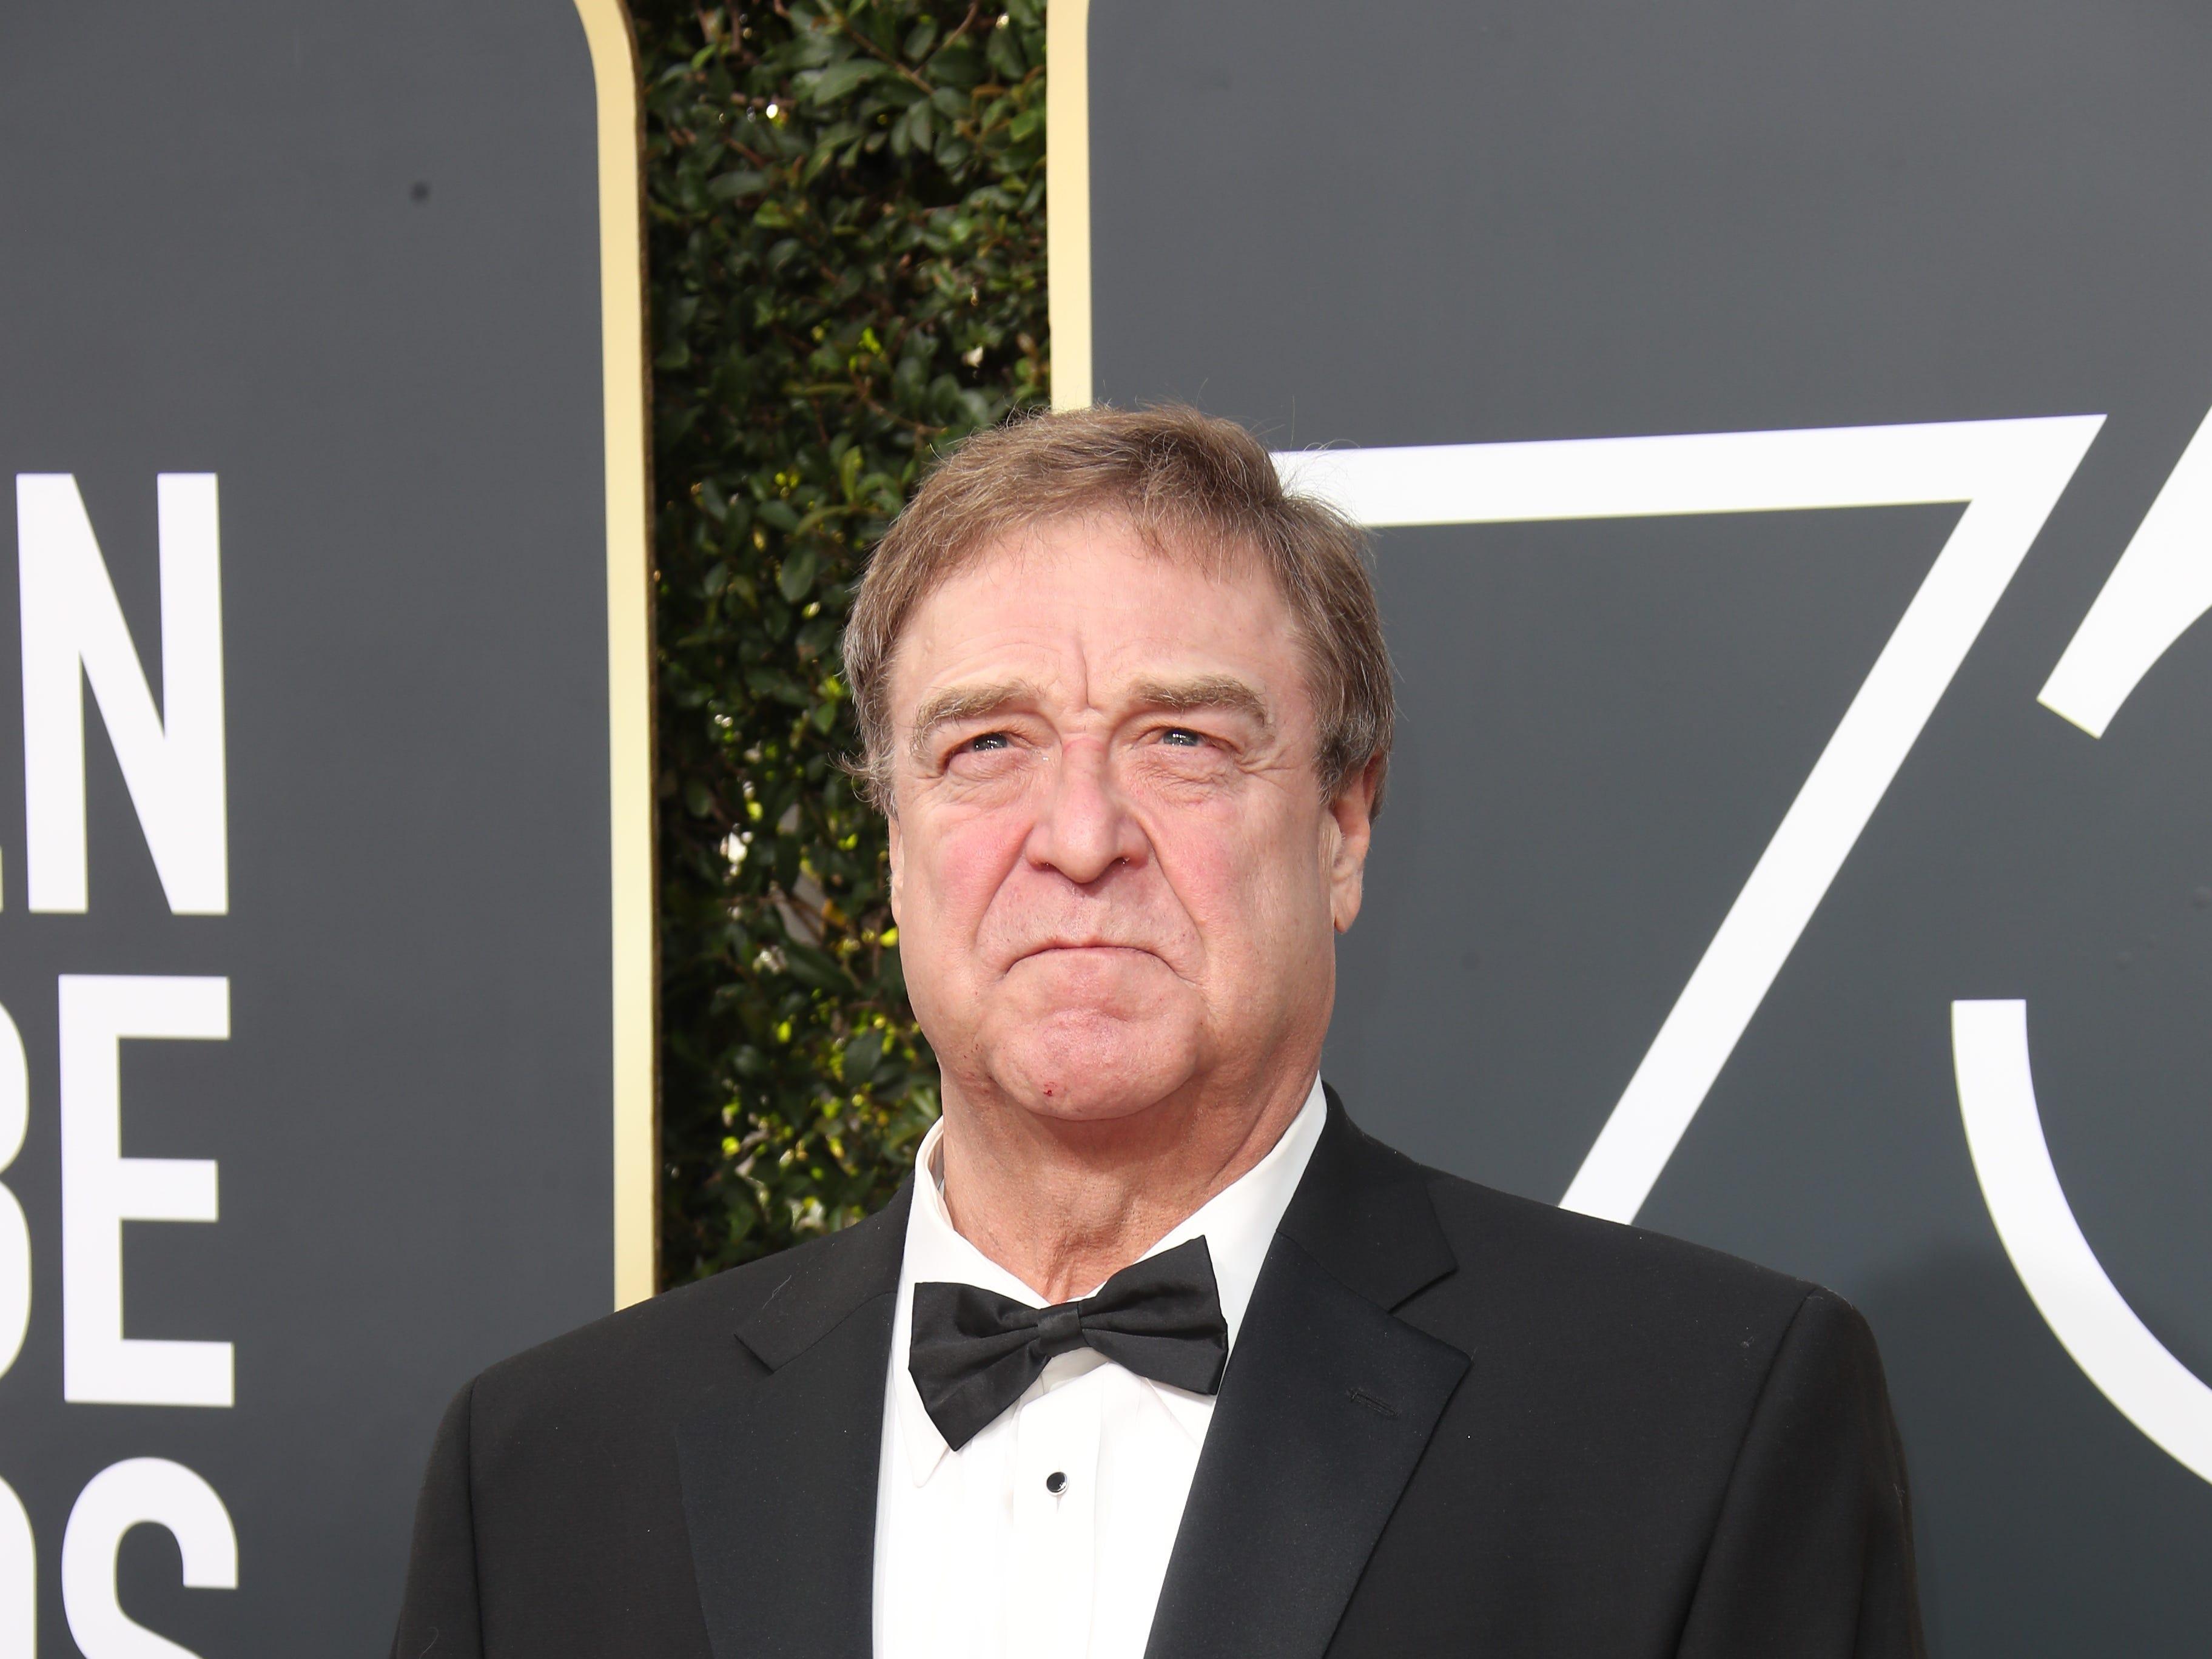 Jan 7, 2018; Beverly Hills, CA, USA; John Goodman arrives for the 75th Golden Globe Awards at the Beverly Hilton. Mandatory Credit: Dan MacMedan-USA TODAY NETWORK (Via OlyDrop)